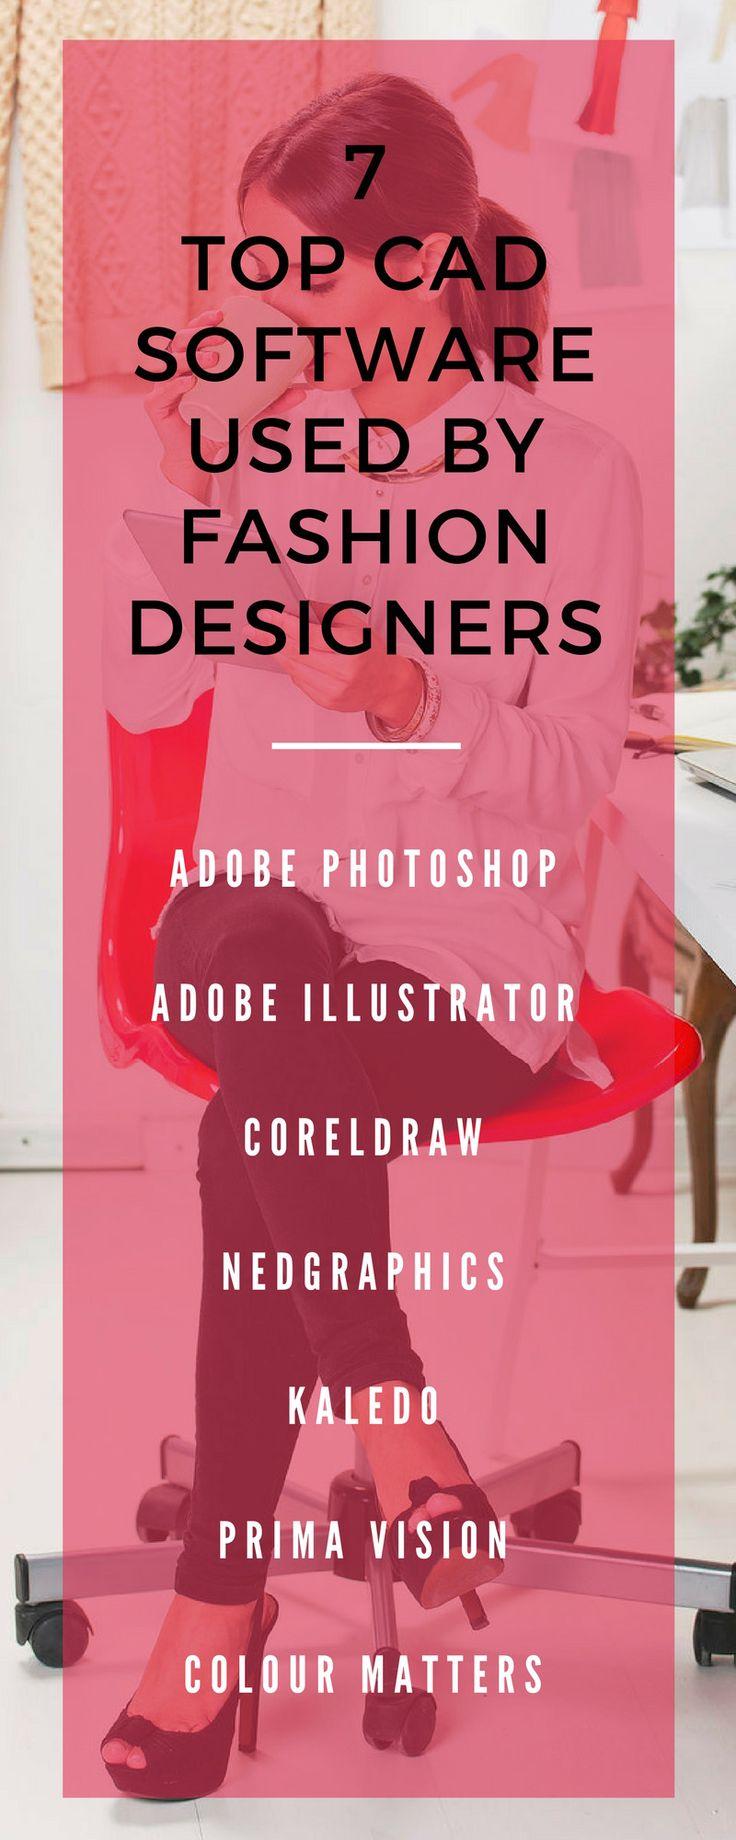 Fashion cad designer job description 23